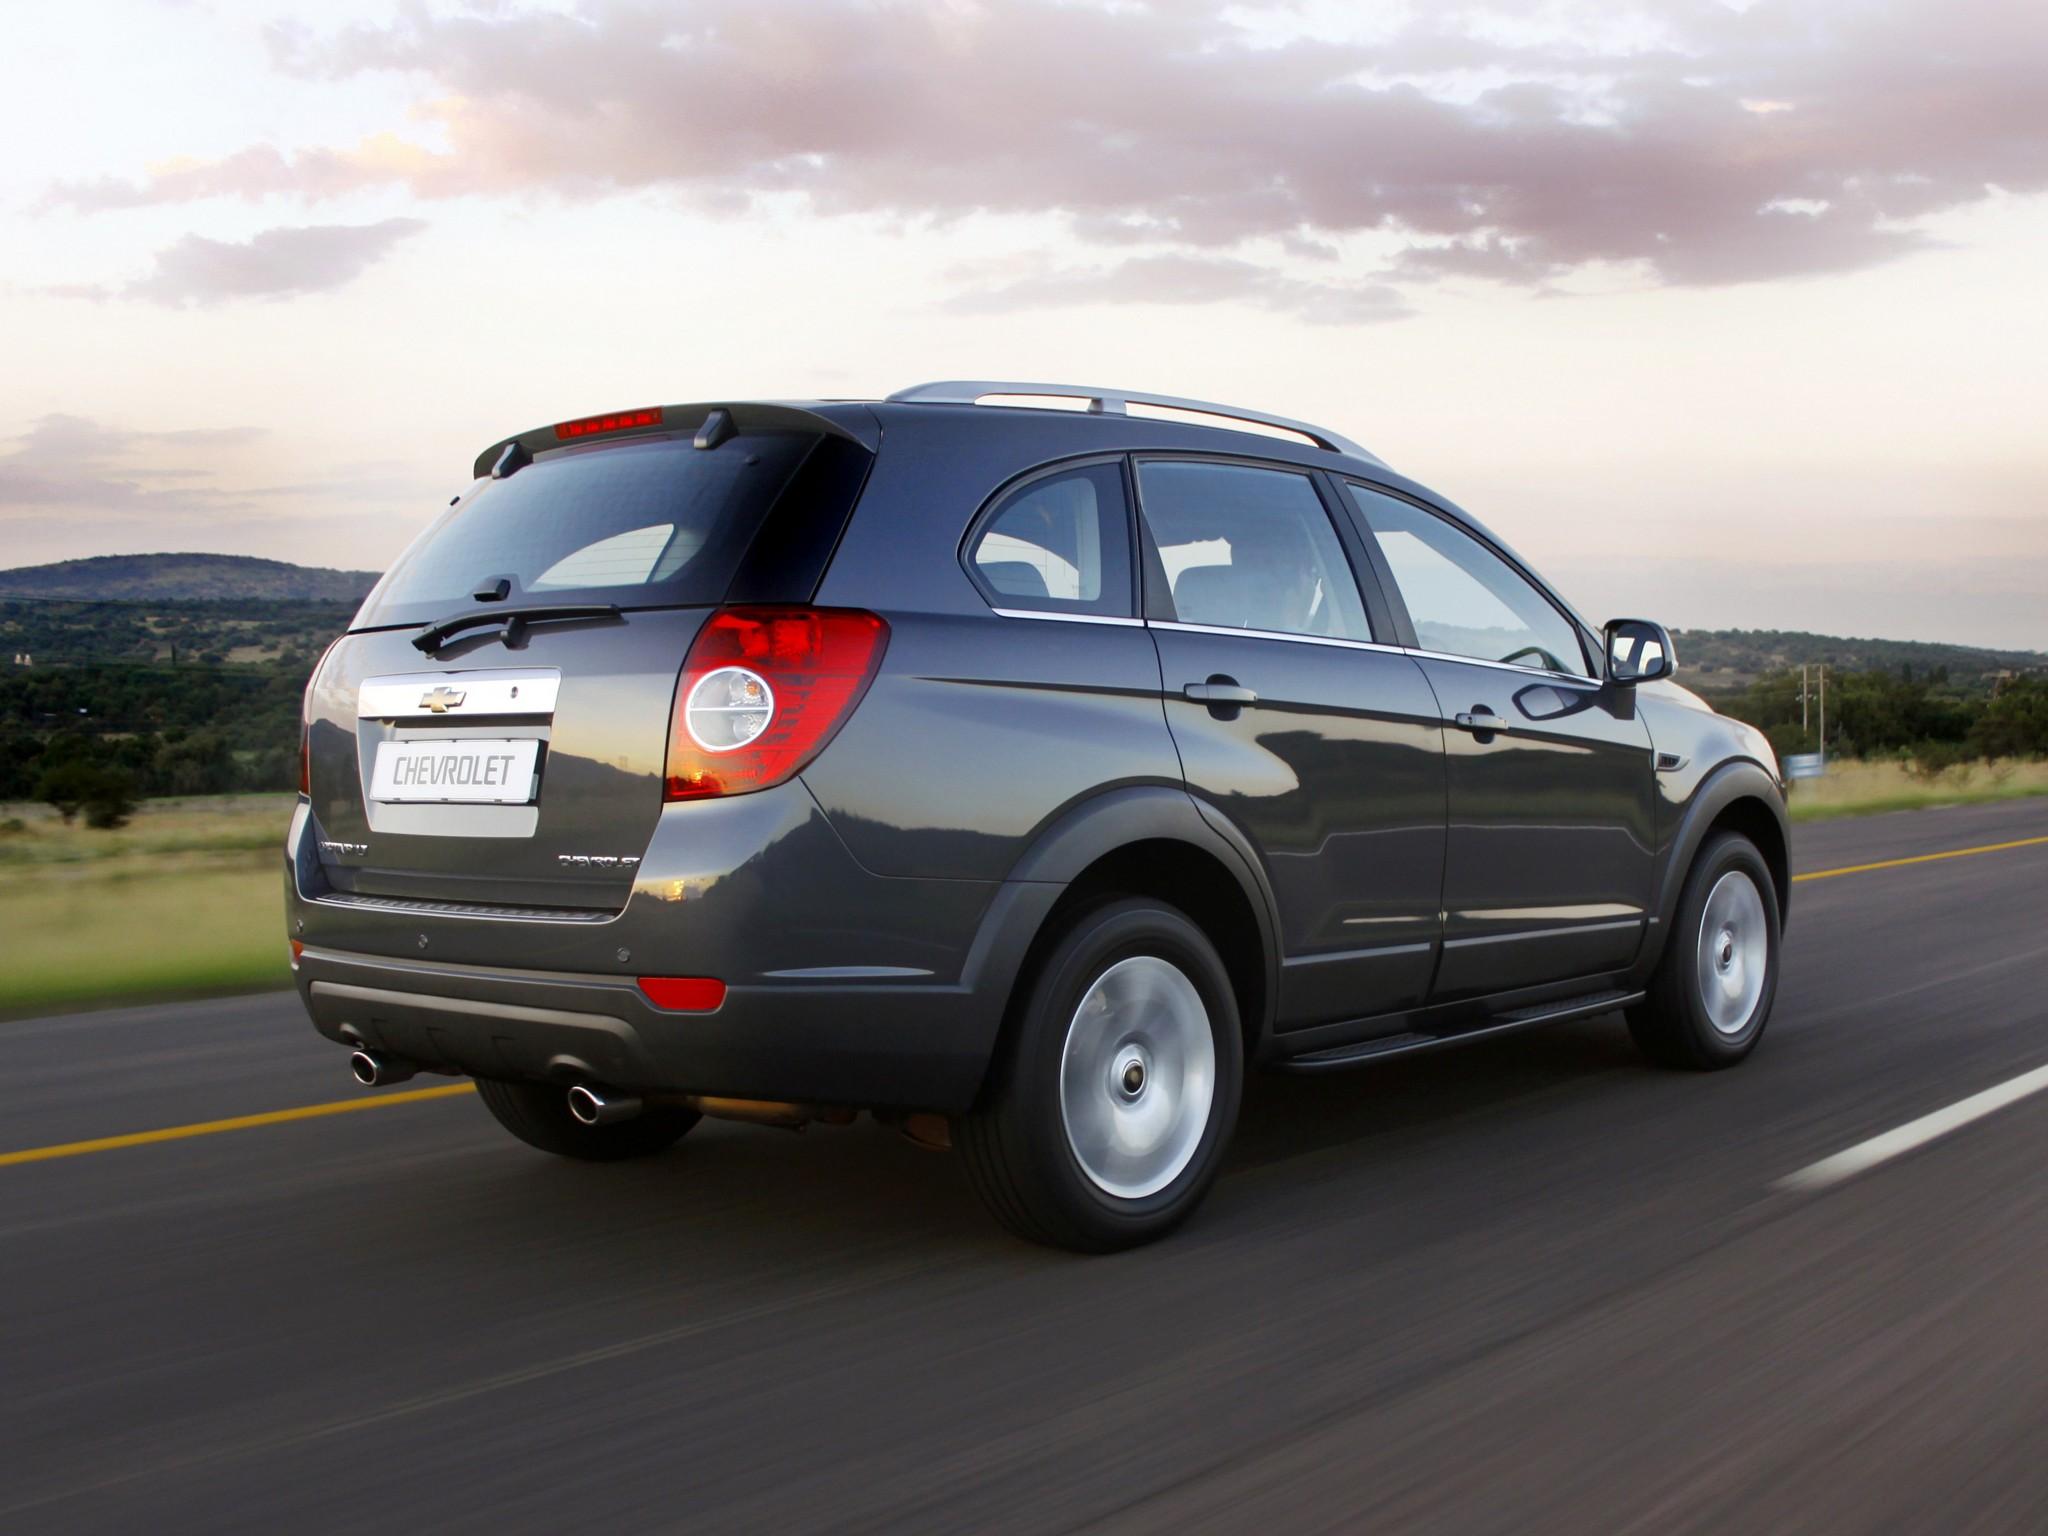 Chevrolet Captiva 2011 2012 2013 2014 2015 2016